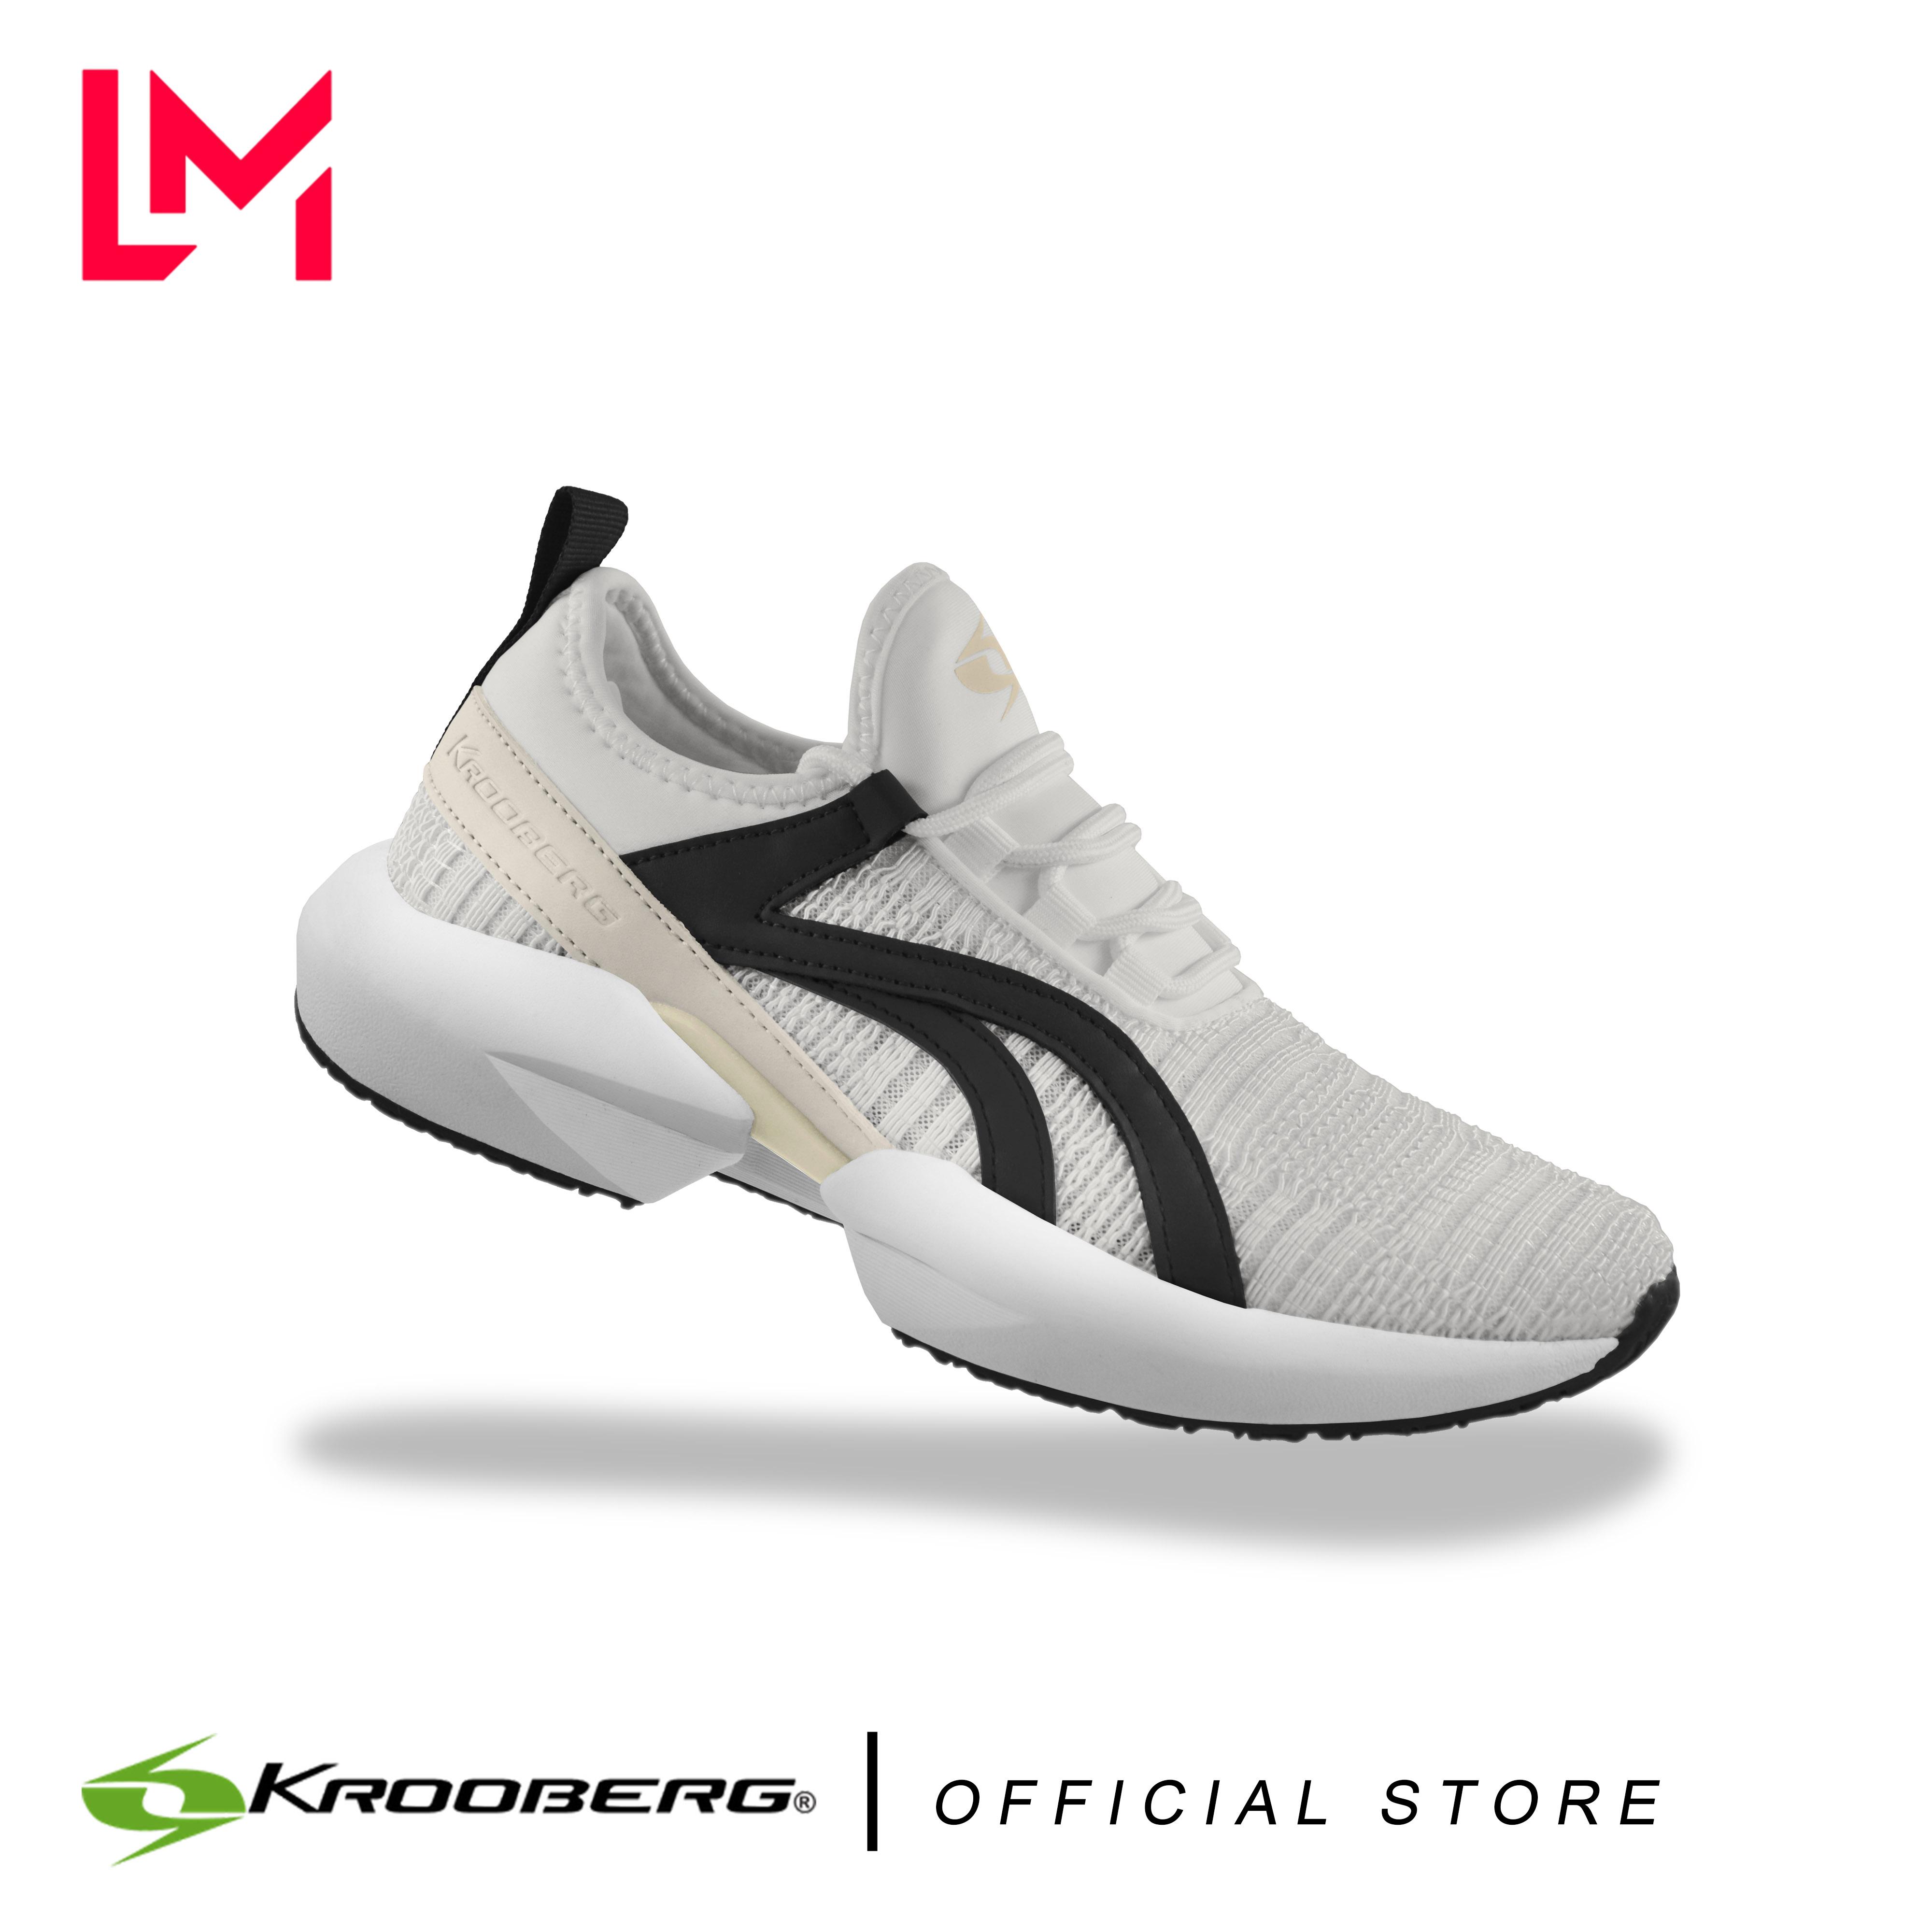 Krooberg Tuscany Women's Shoes: Buy